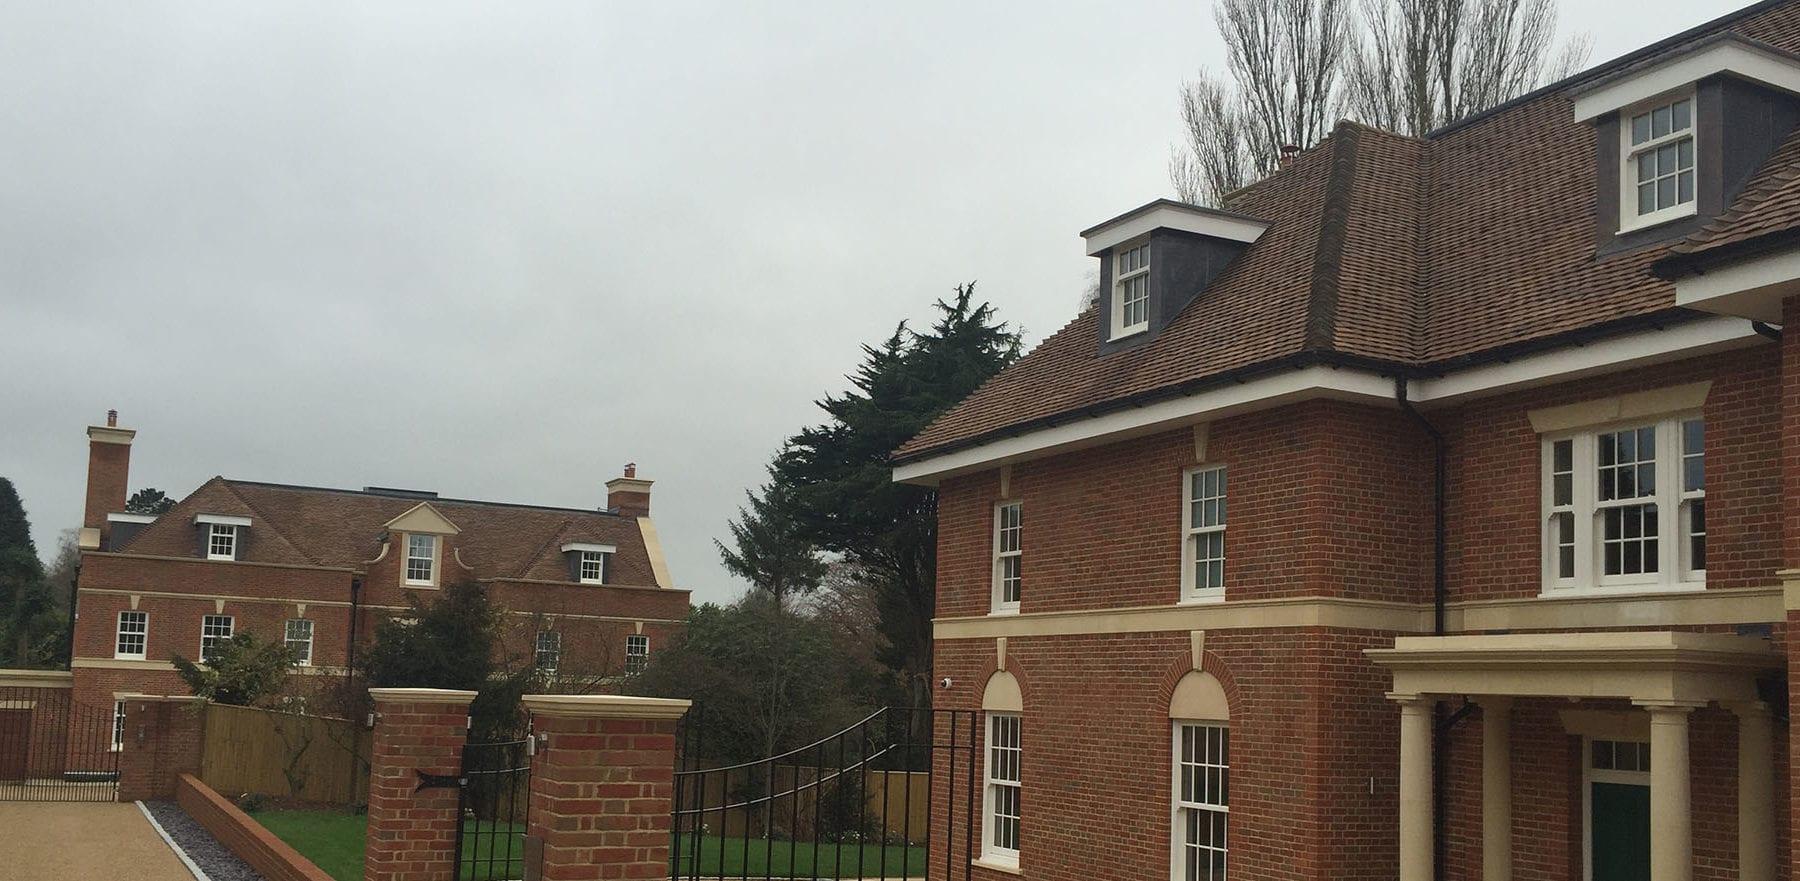 Lifestiles - Handmade Brown Clay Roof Tiles - Tunbridge Wells, England 5